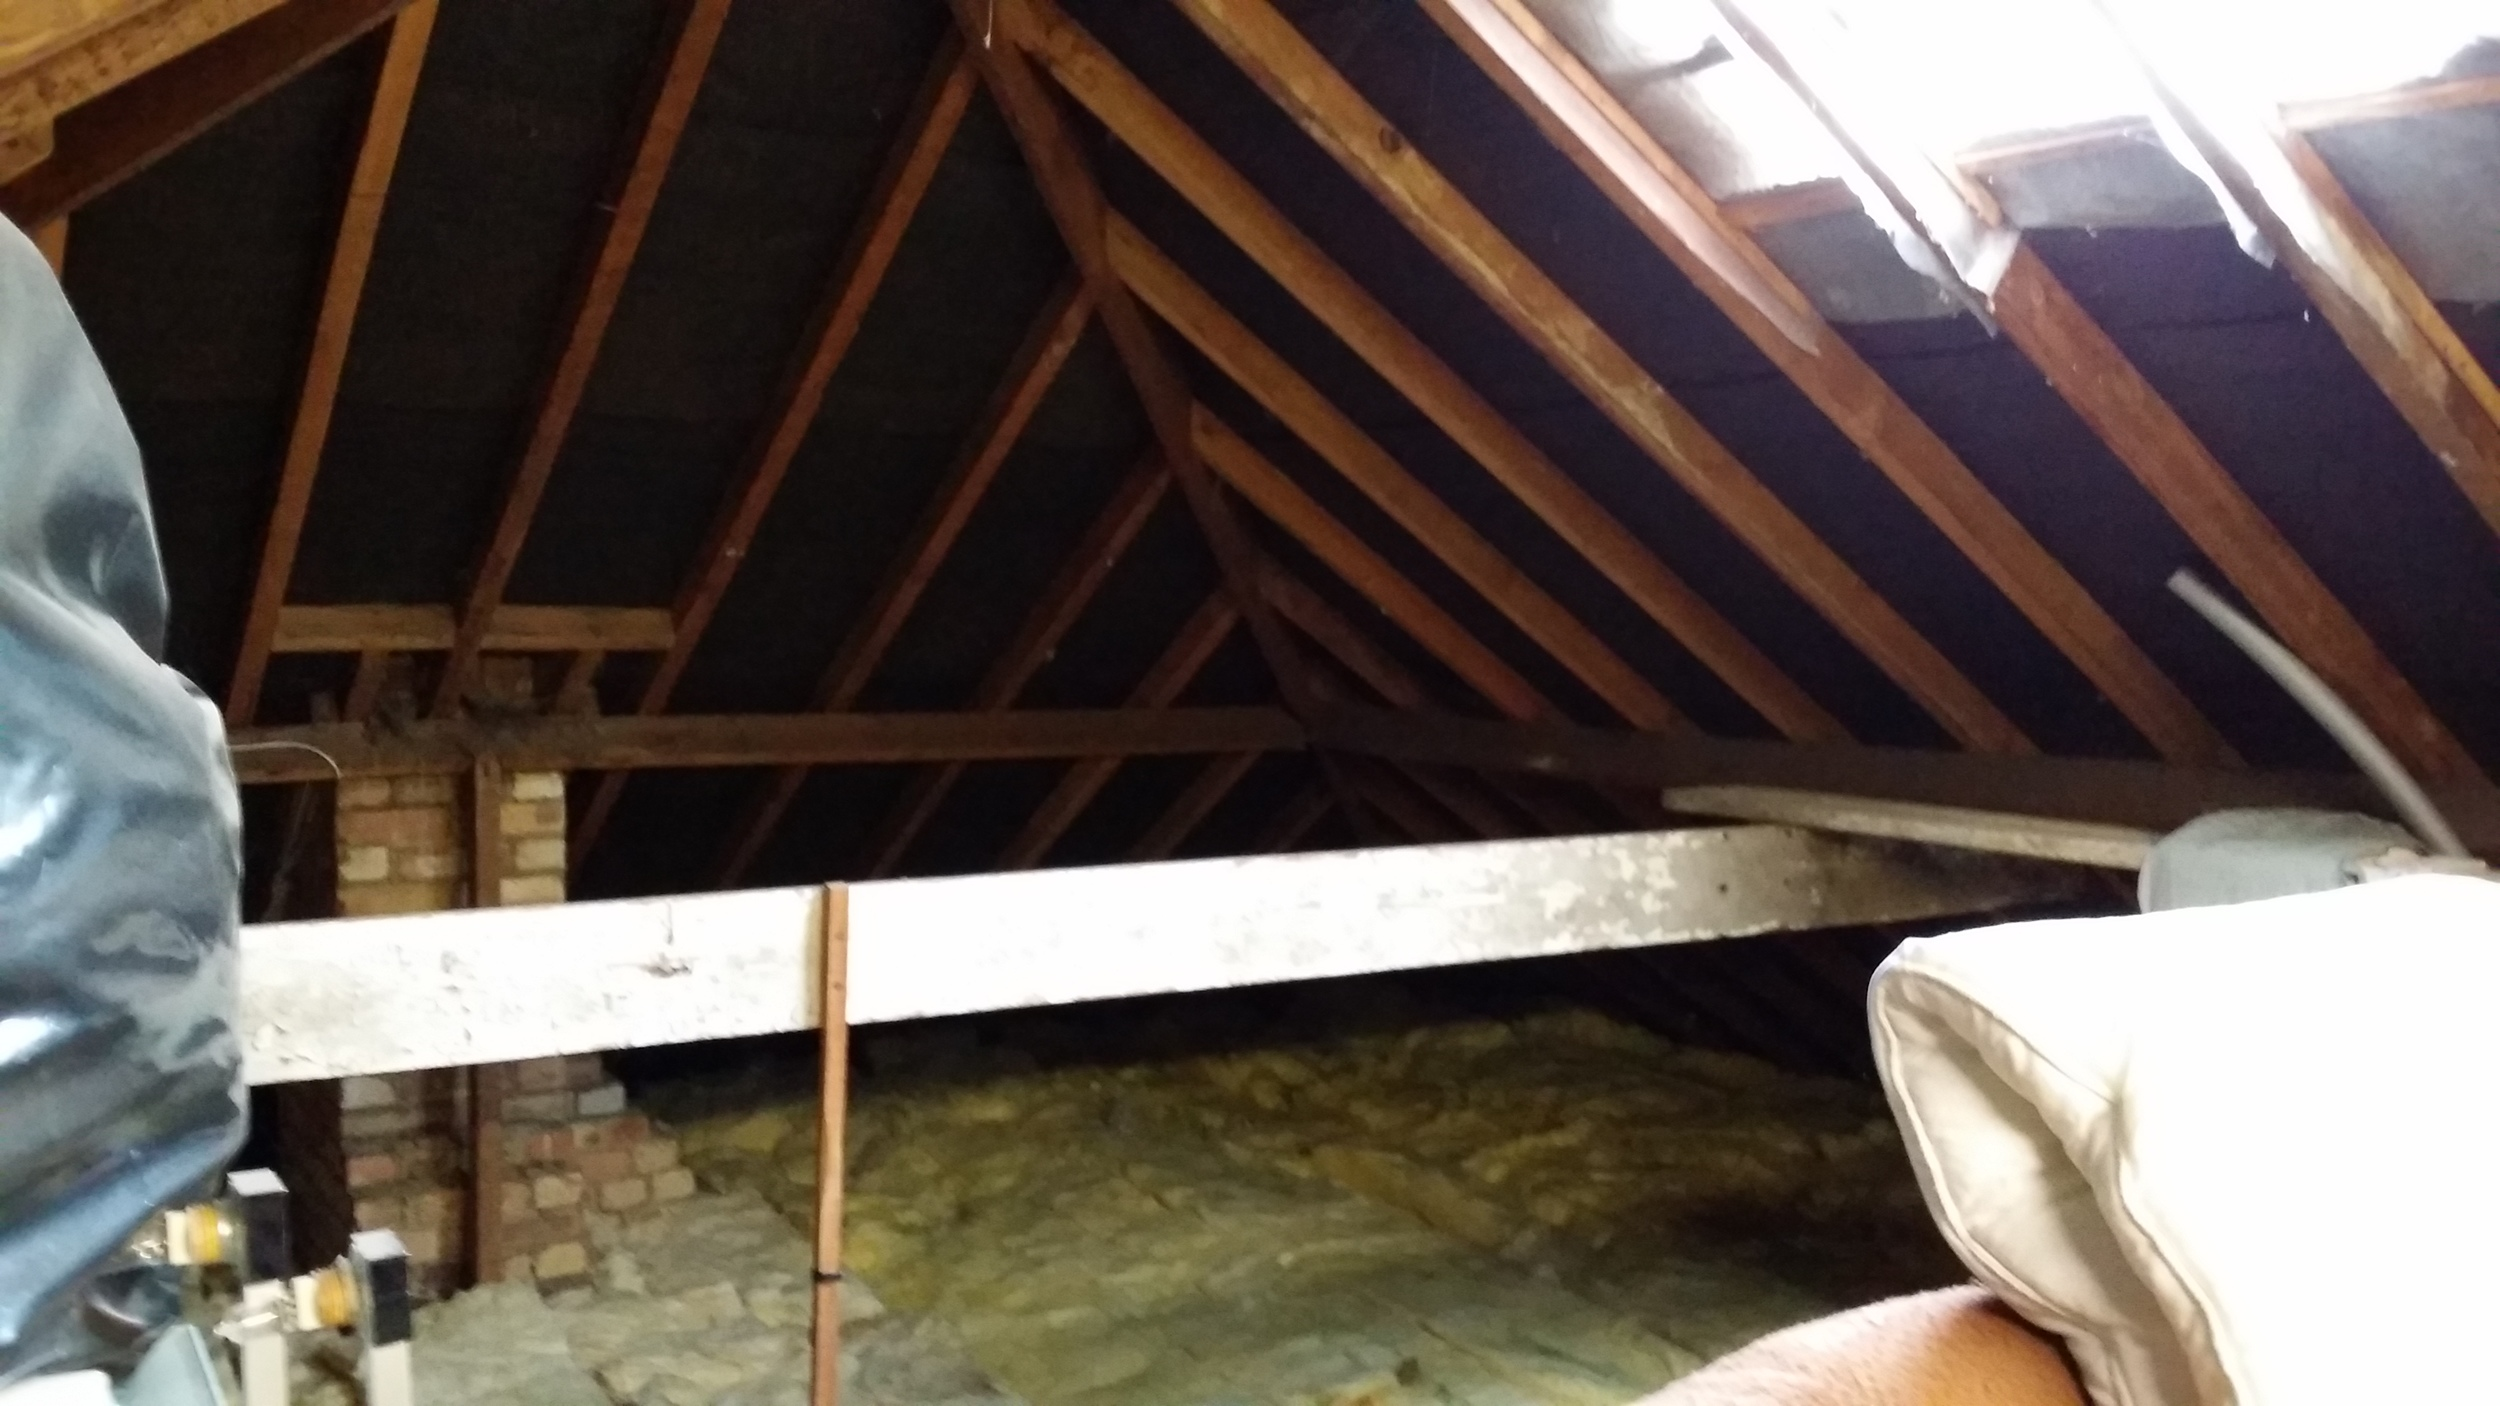 Pre Conversion - Loft Space - West & North Roof Slopes